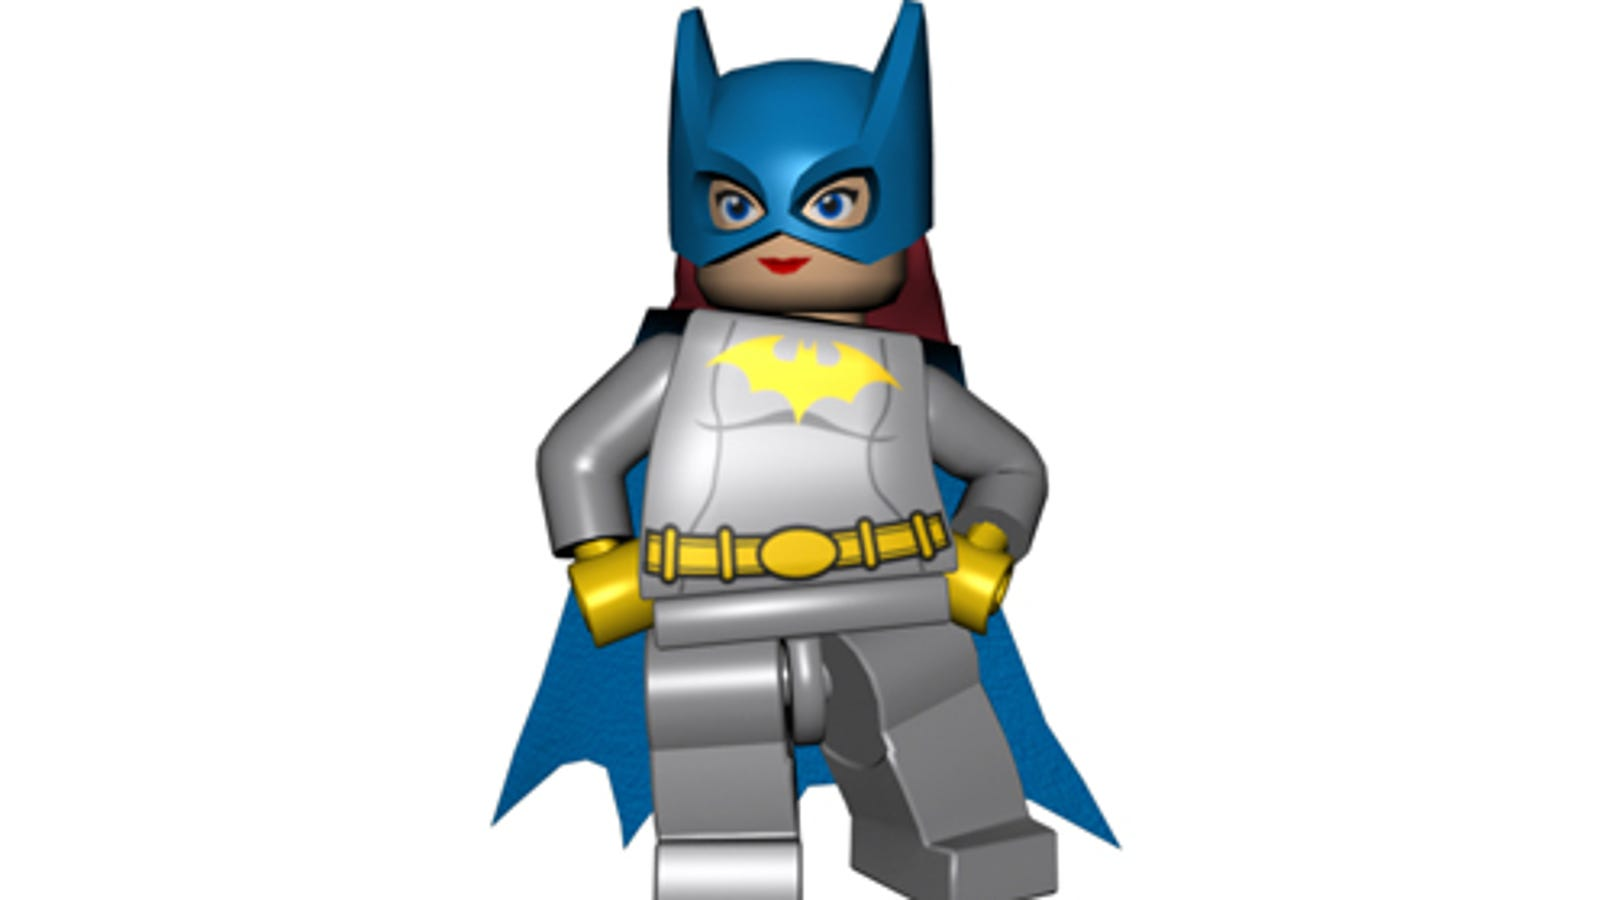 New Lego Batman Character Announced, Batgirl!